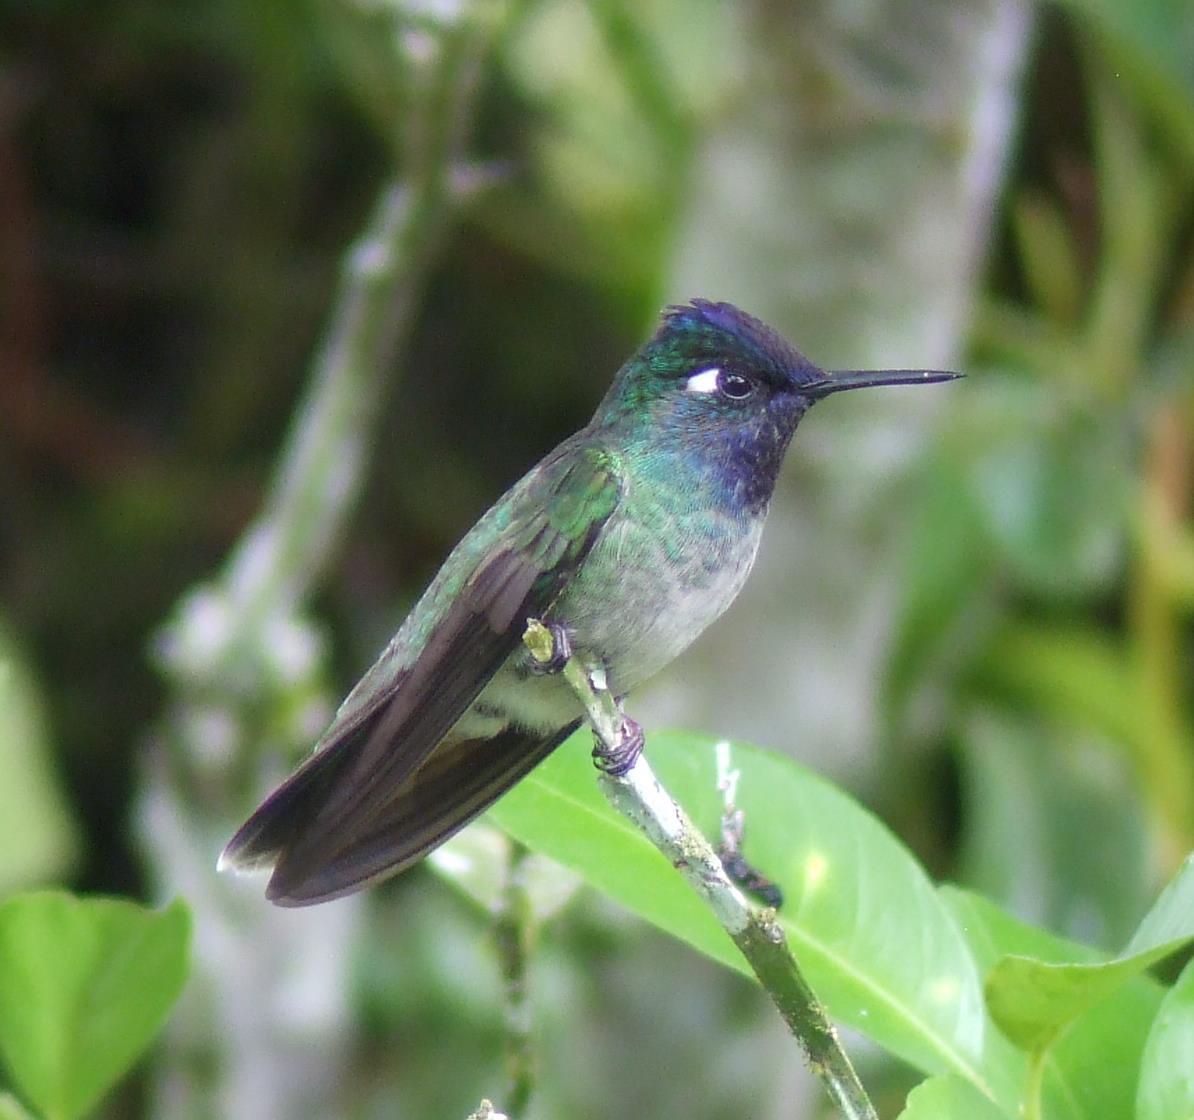 Violet-headed Hummingbird. Photo: Alex Durand